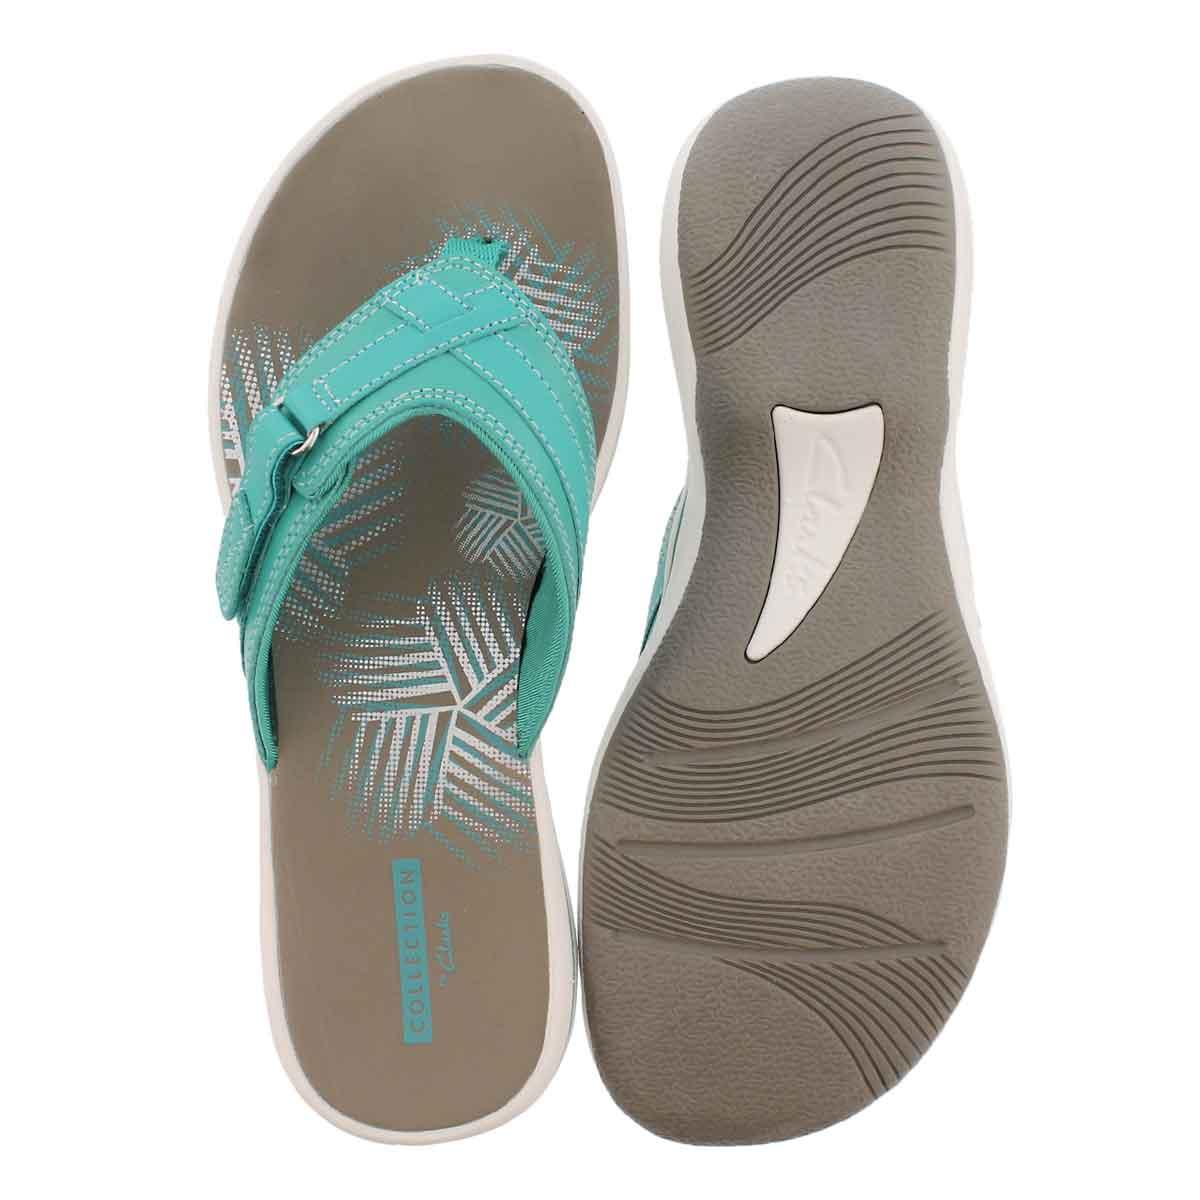 Lds Breeze Sea turquoise thong sandal